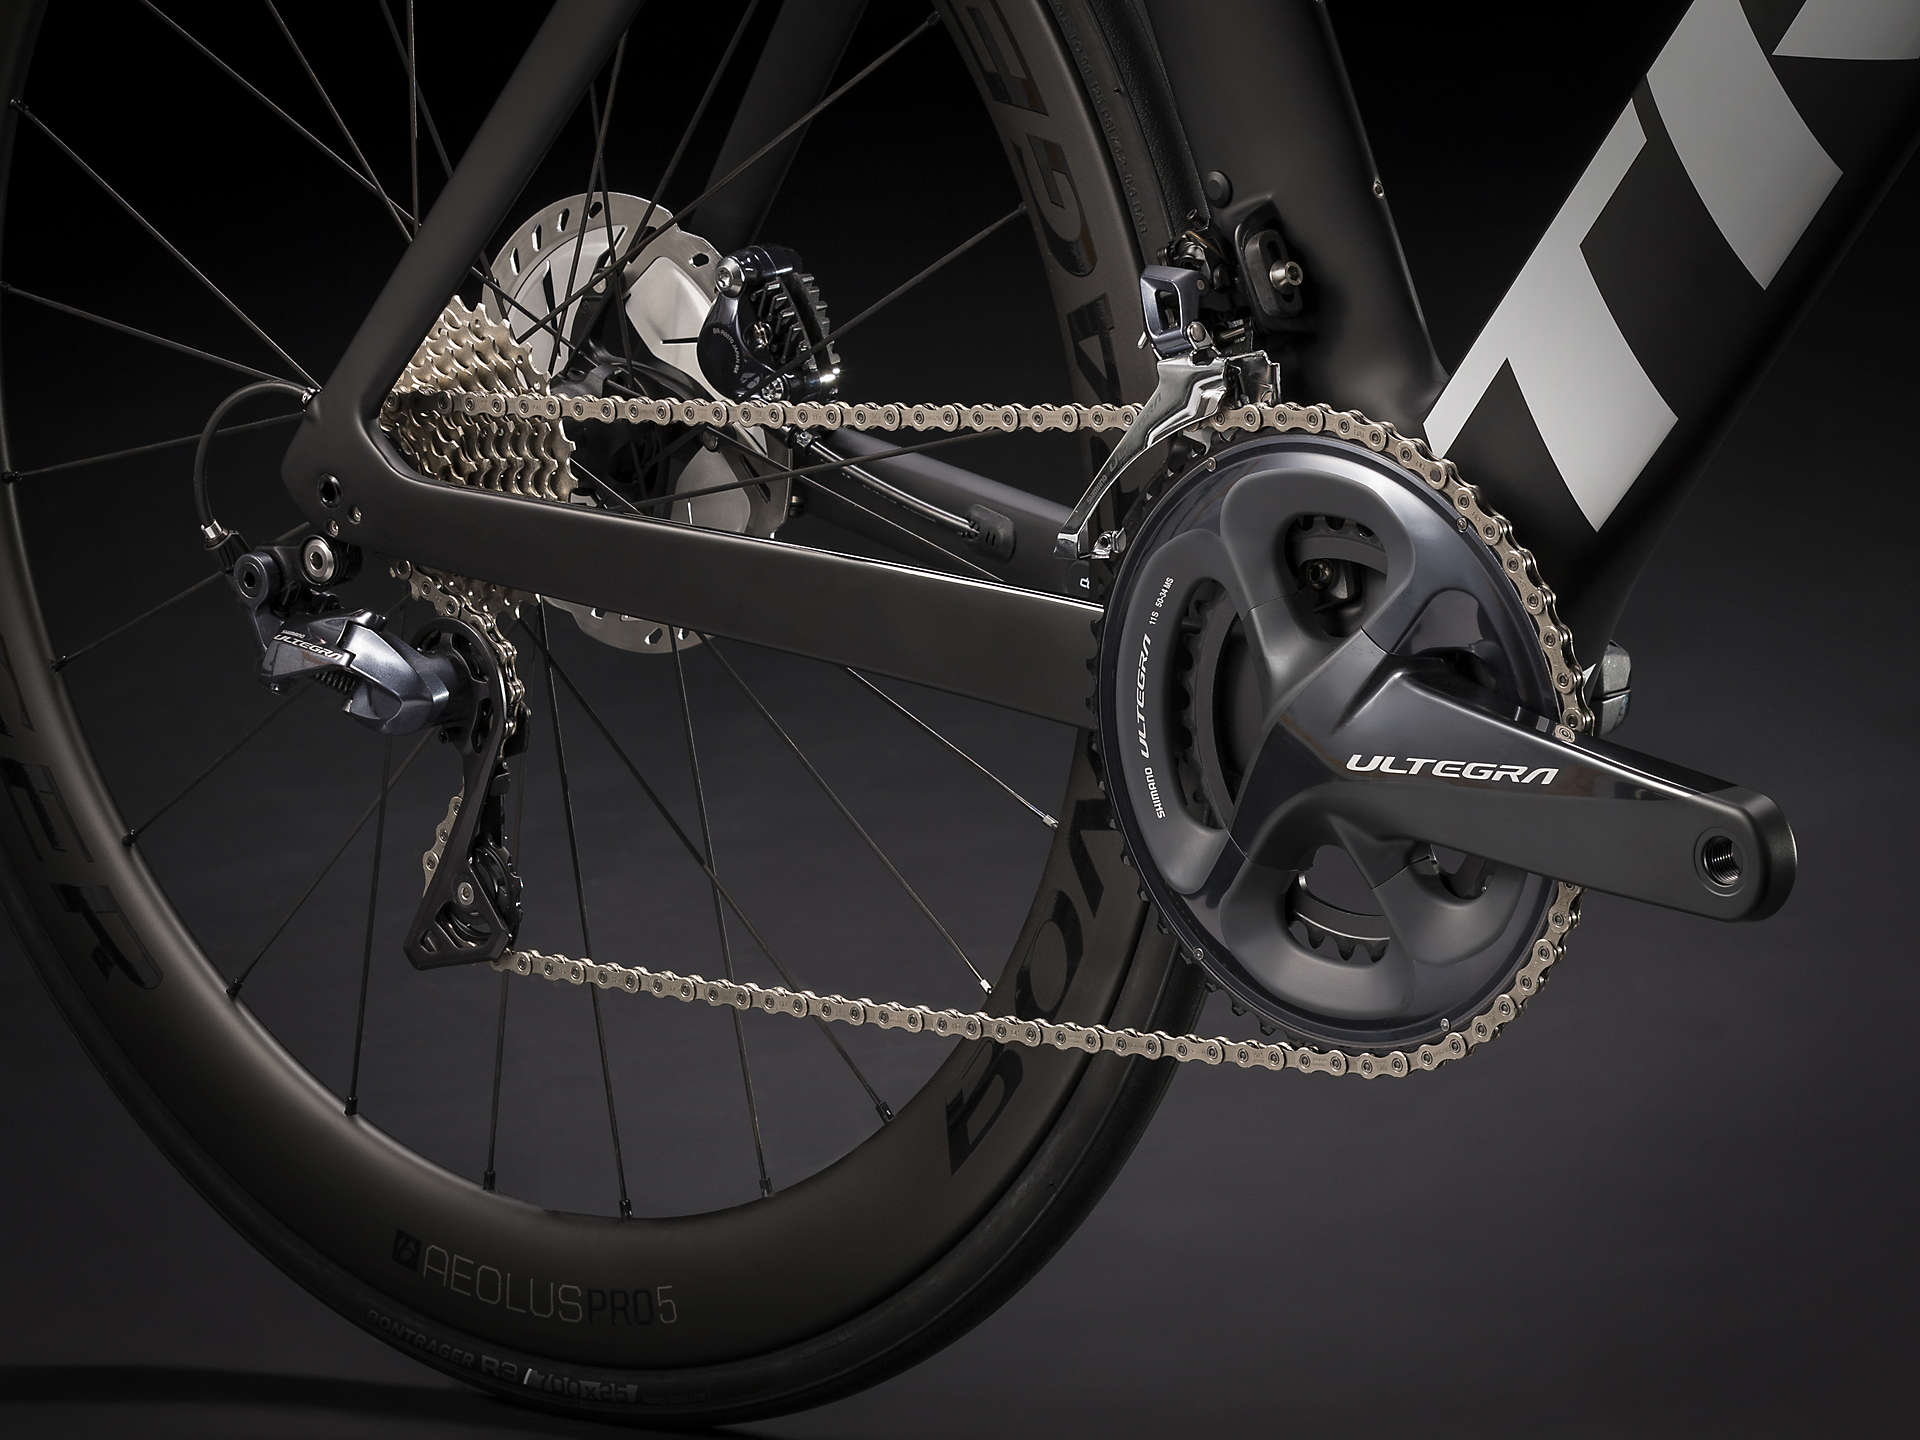 Bicicleta Trek Madone Speed Disco - Tamanho 54 - 2020